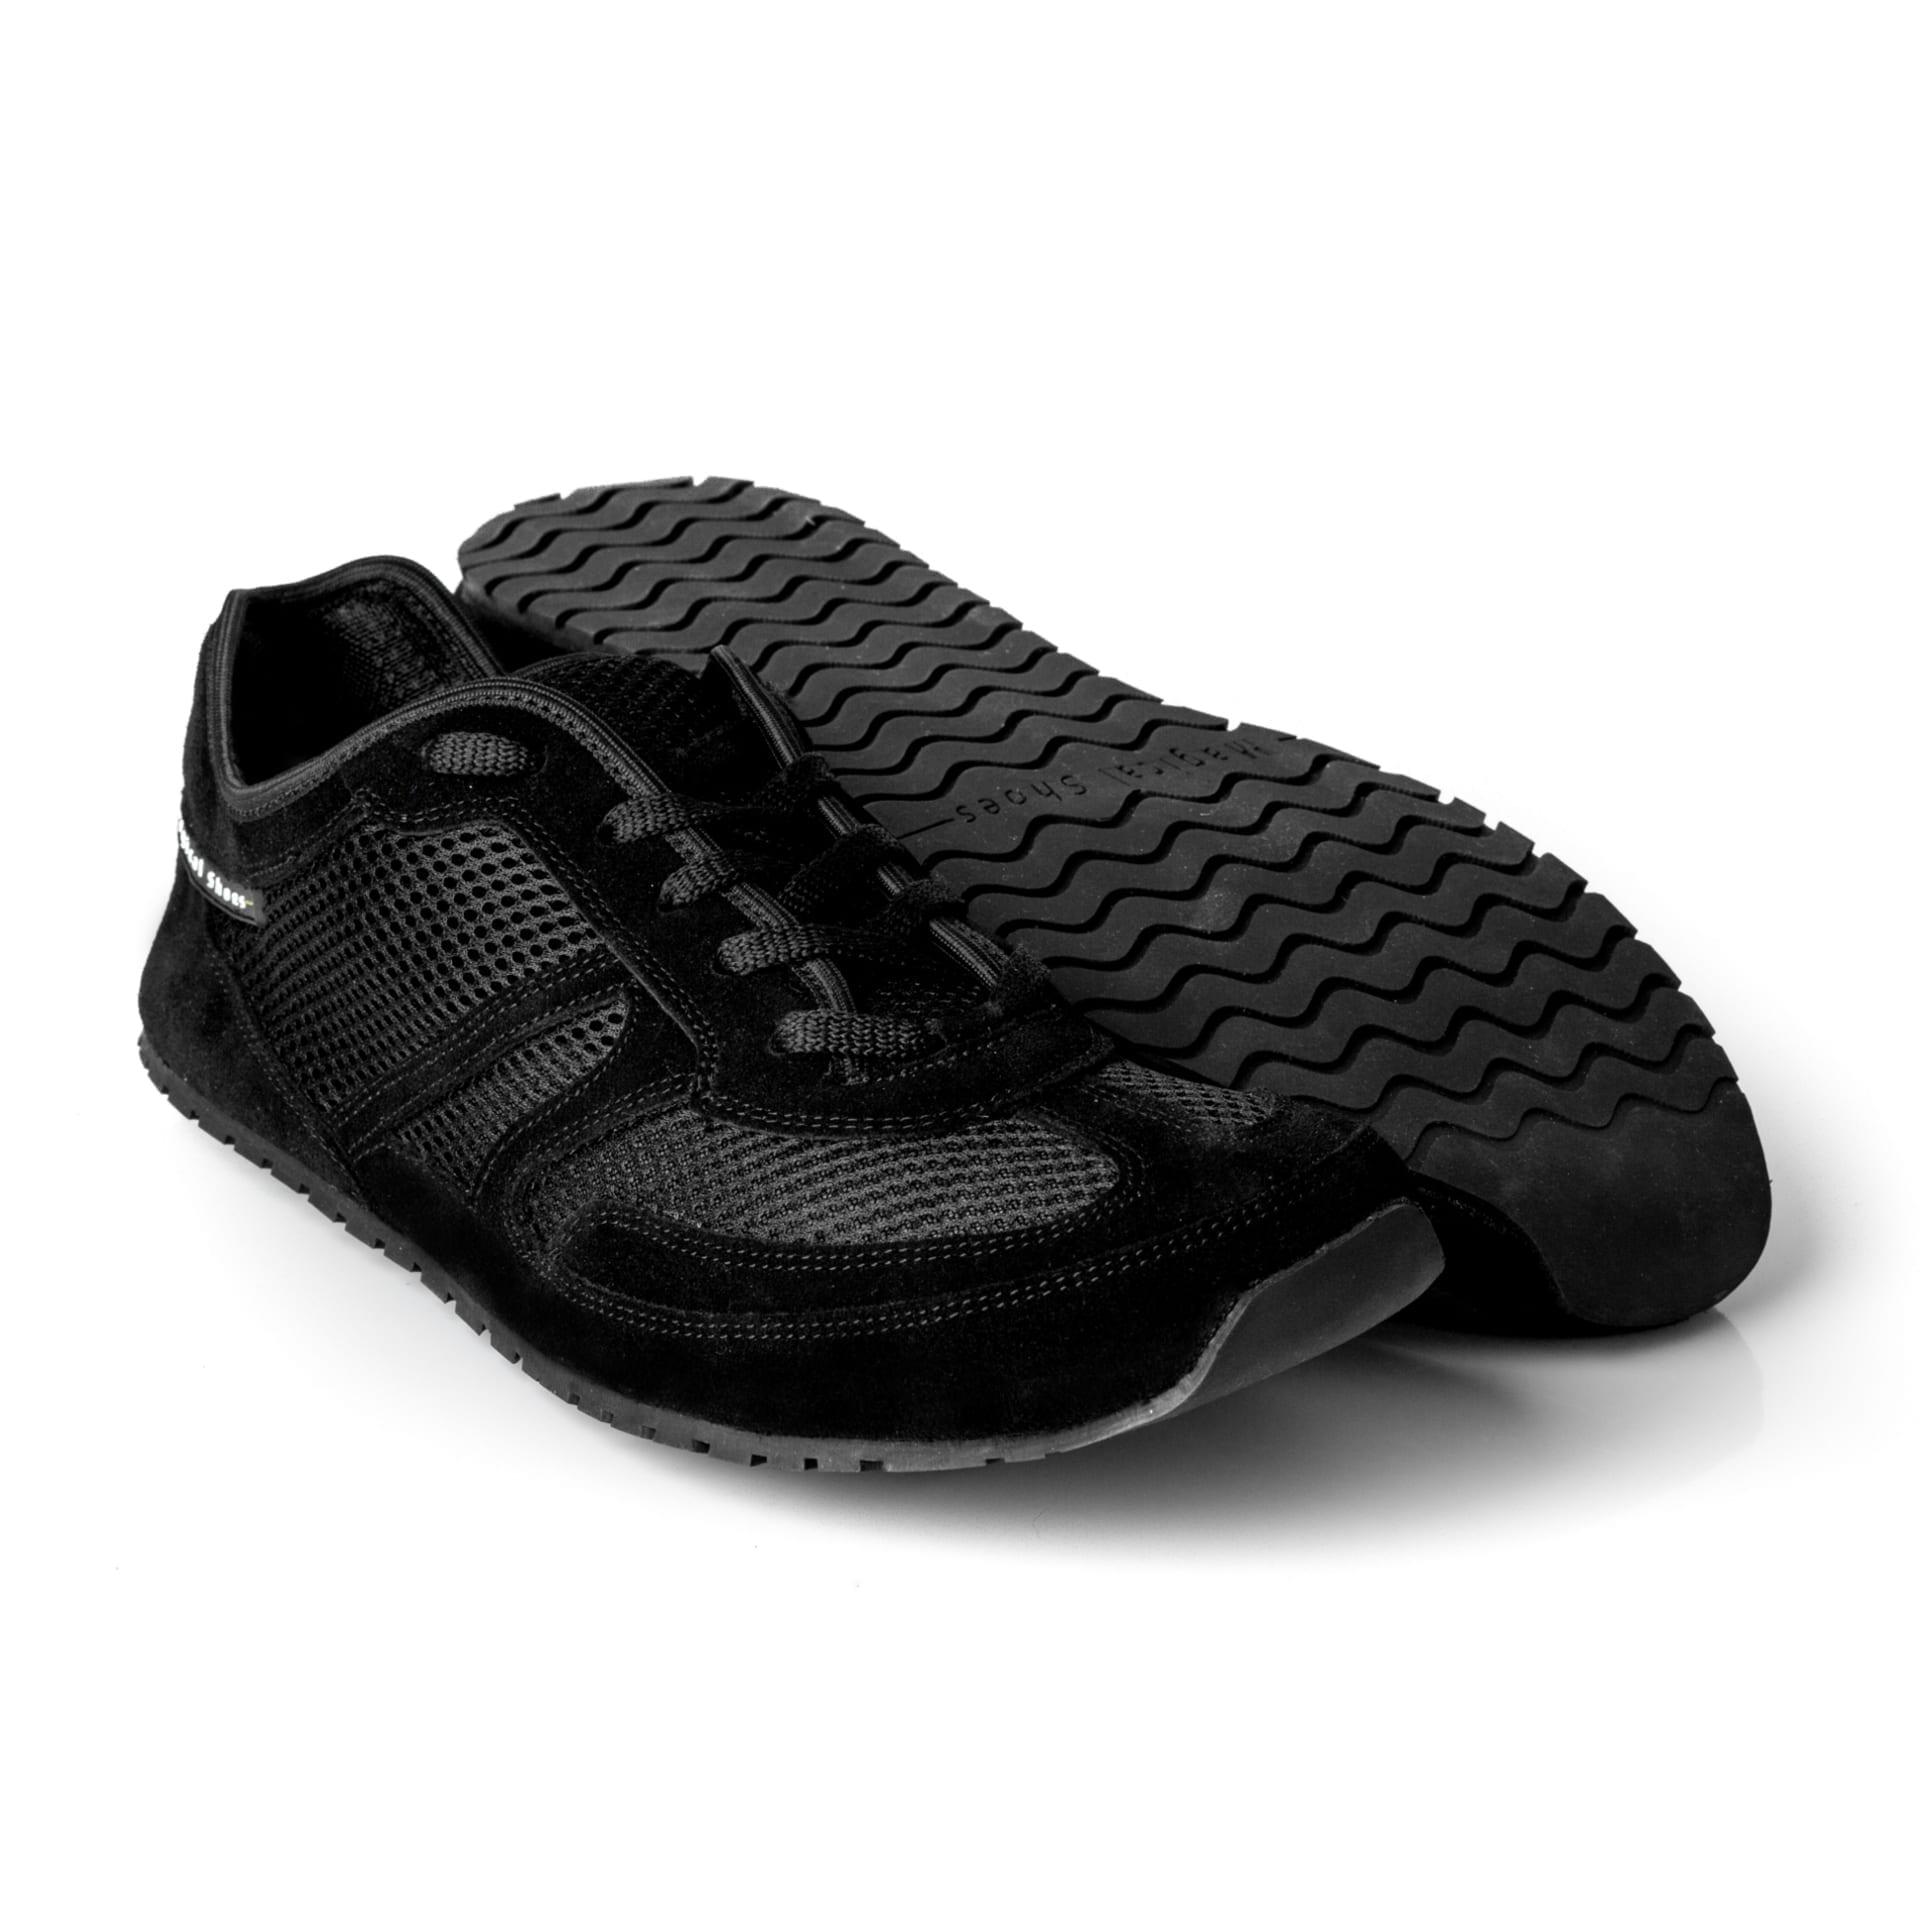 Magical Shoes BAREFOOT SHOES EXPLORER CLASSIC BLACK KIDS picture 1